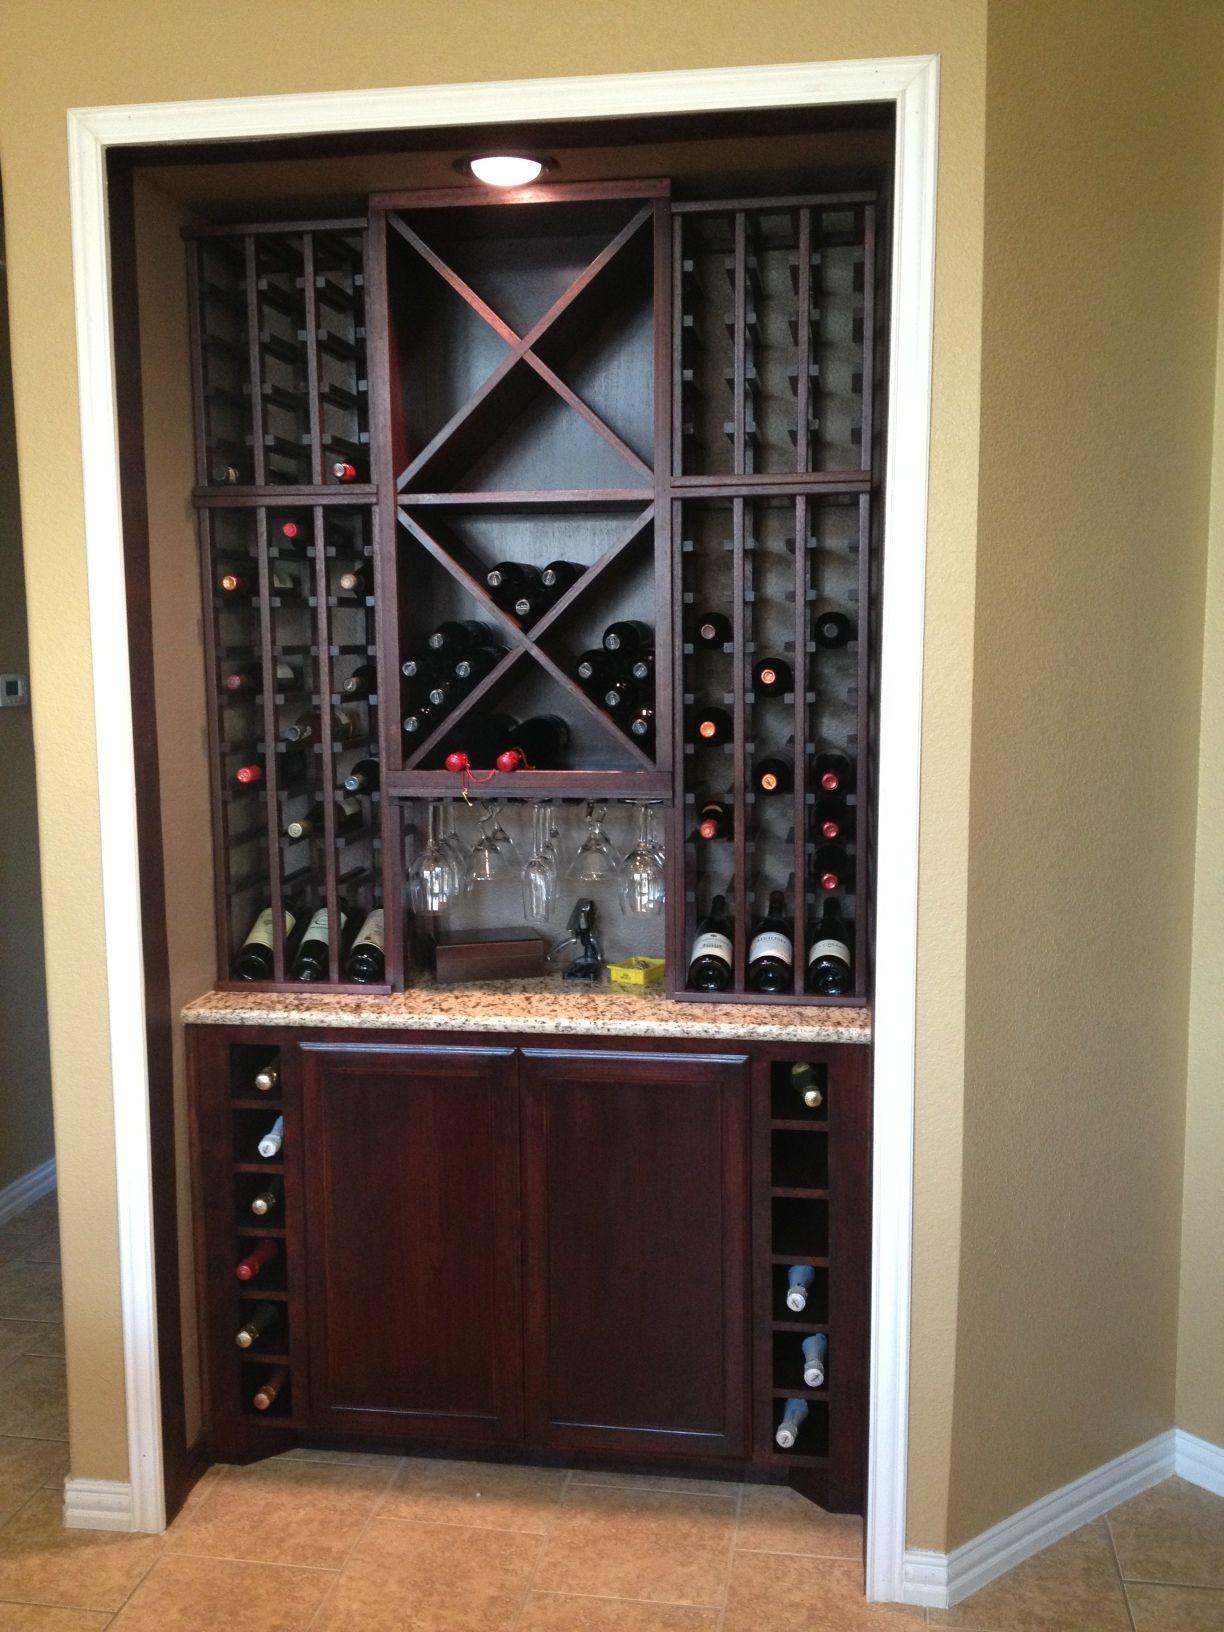 Wine Cellar Design Building Custom Wine Cellars Wineracks Com Built In Wine Rack Custom Wine Cellars Home Wine Cellars